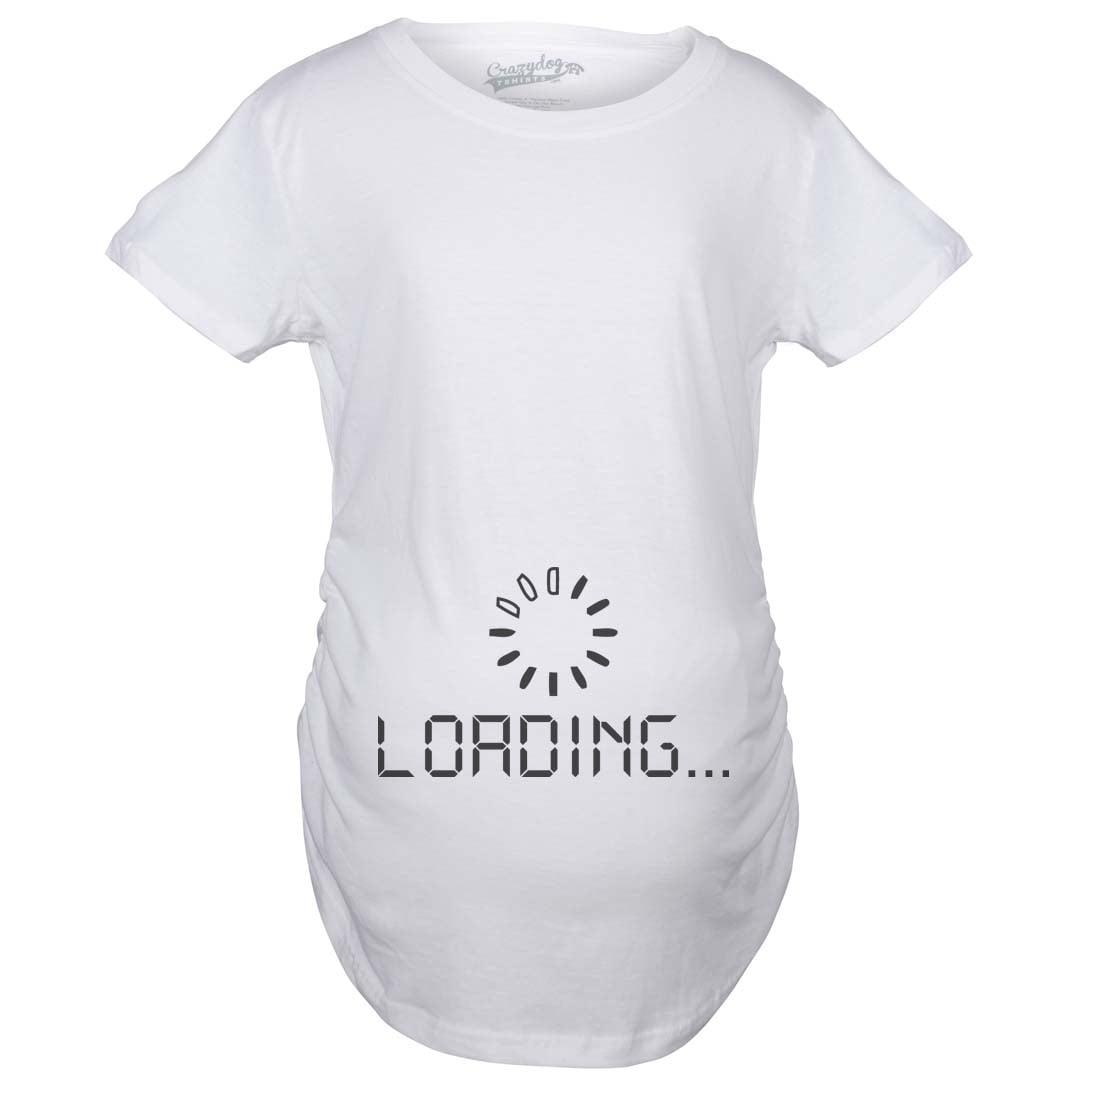 1bdd23e0db1 Crazy Dog Funny T-Shirts - Maternity Baby Loading Shirt Humor Funny Pregnancy  Shirts Cheap Tees - Walmart.com